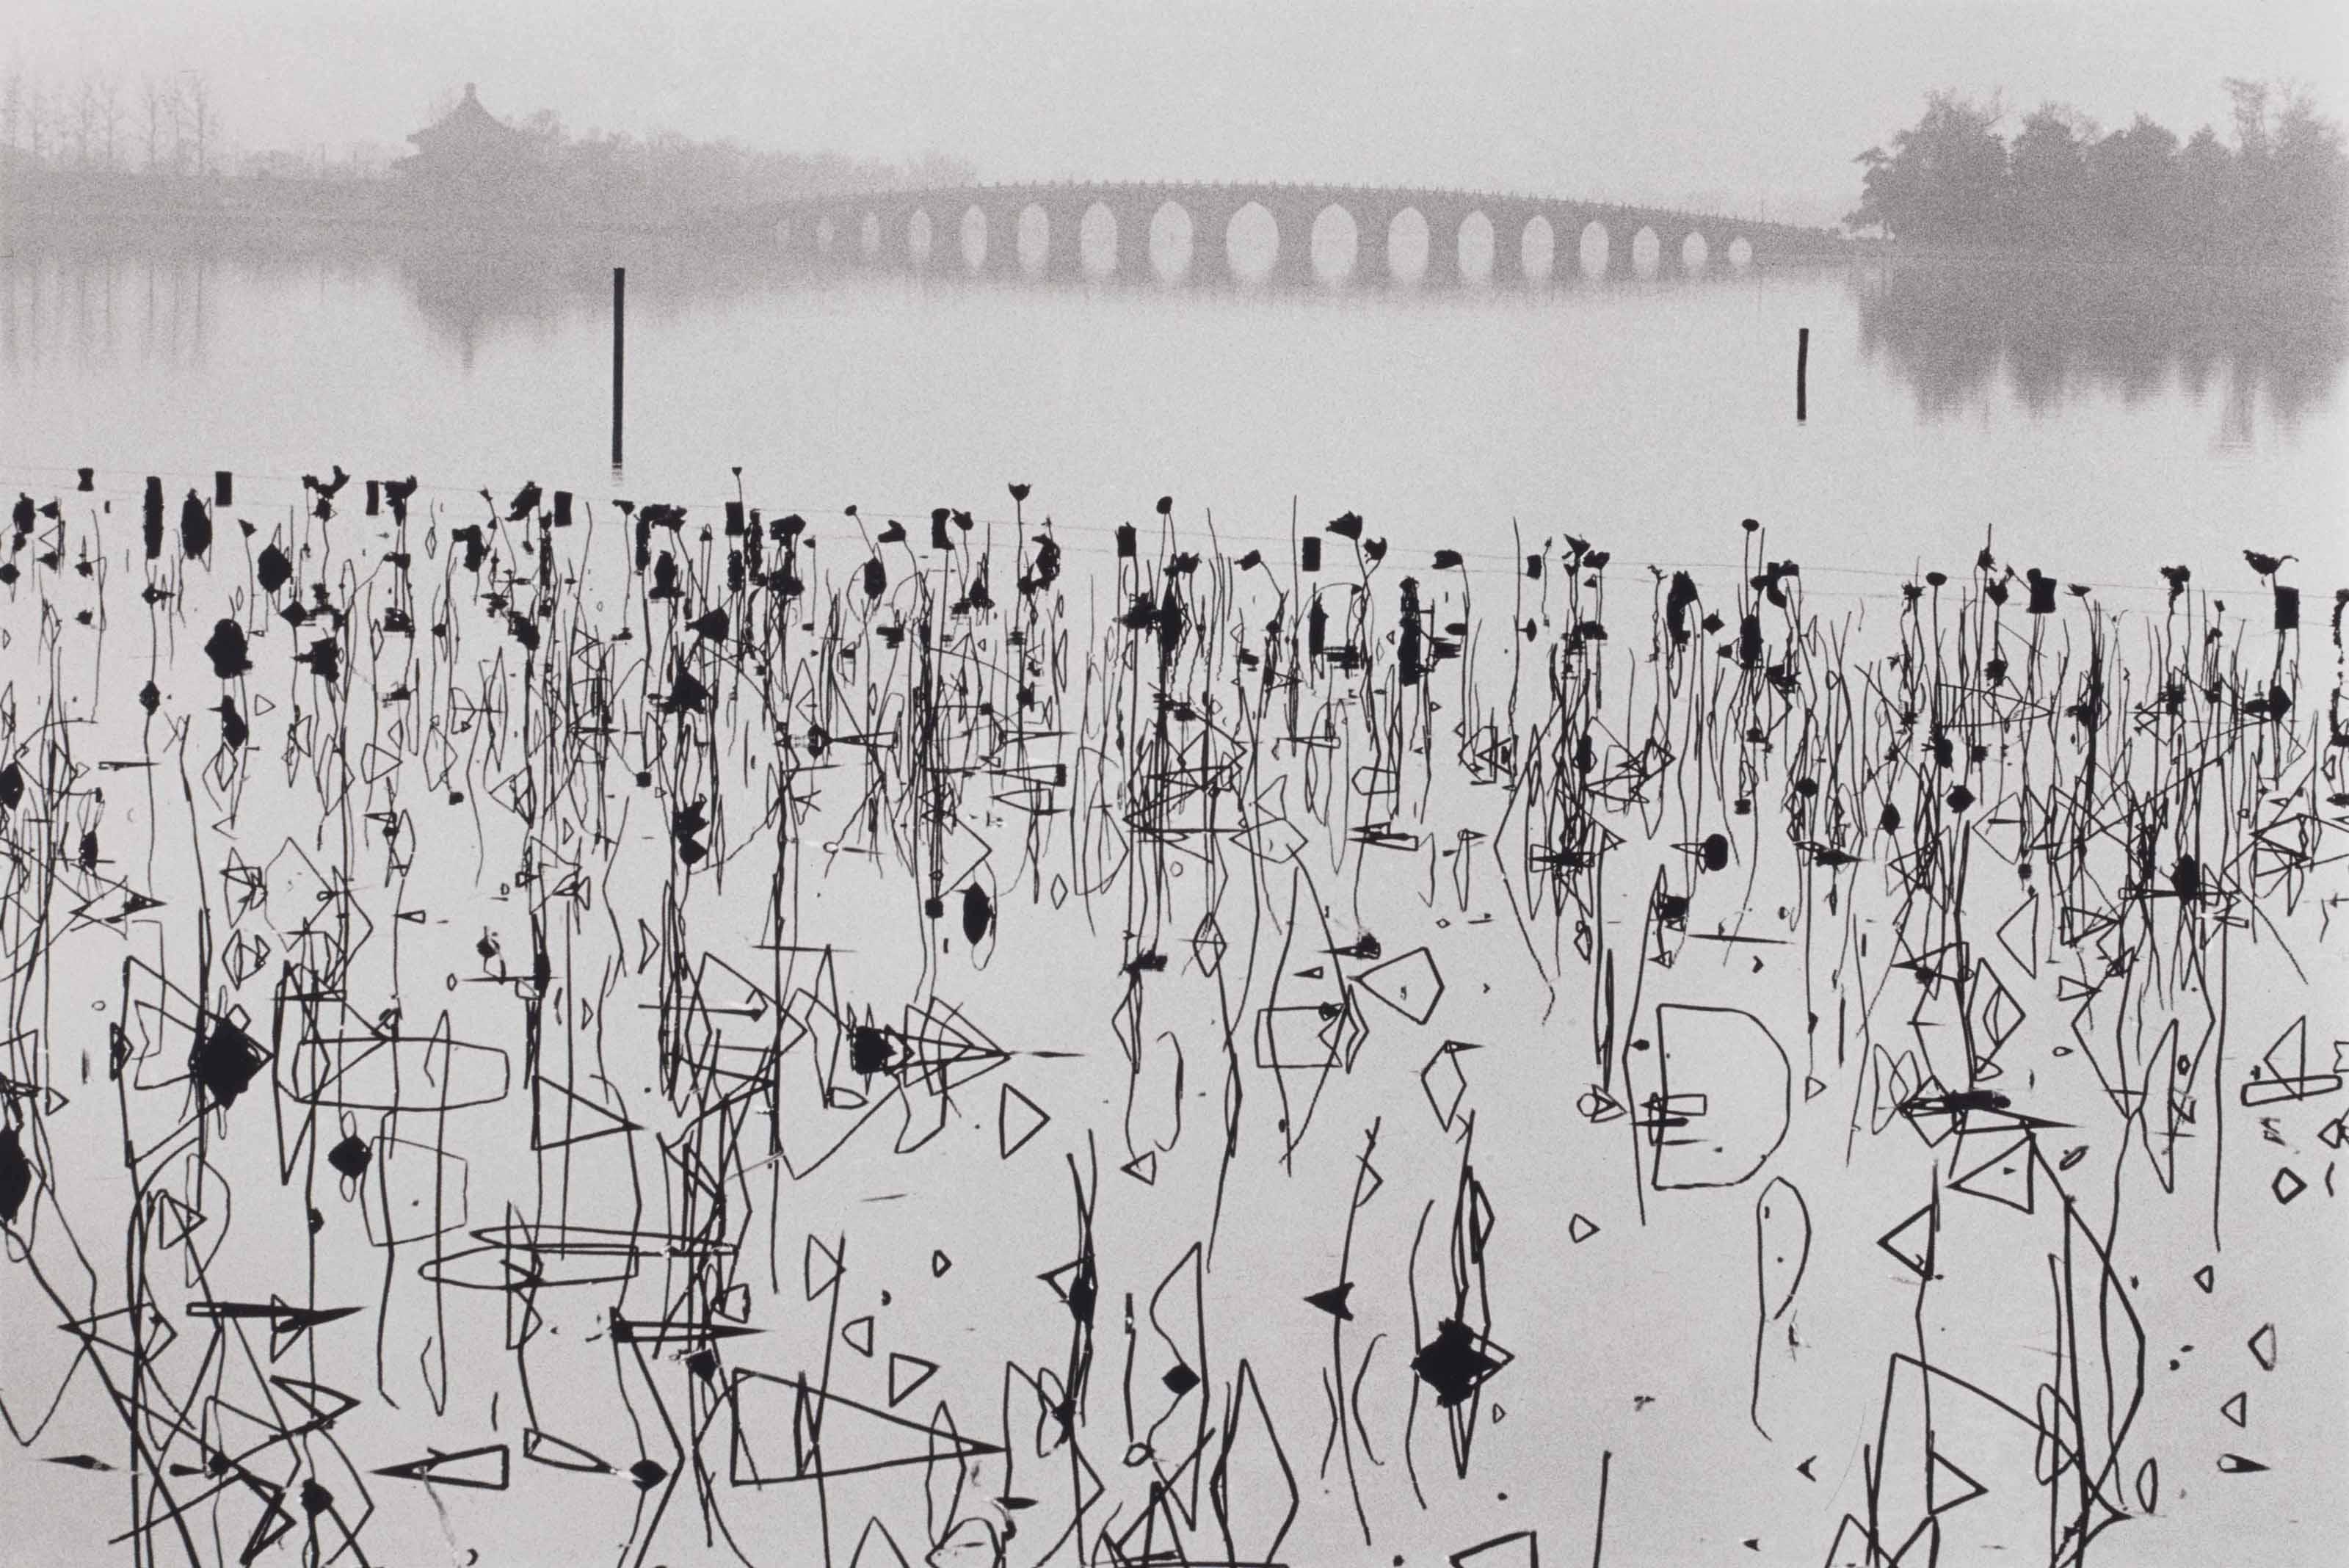 Lac Kumming, Palais d'été, Beijing, Chine, 1964